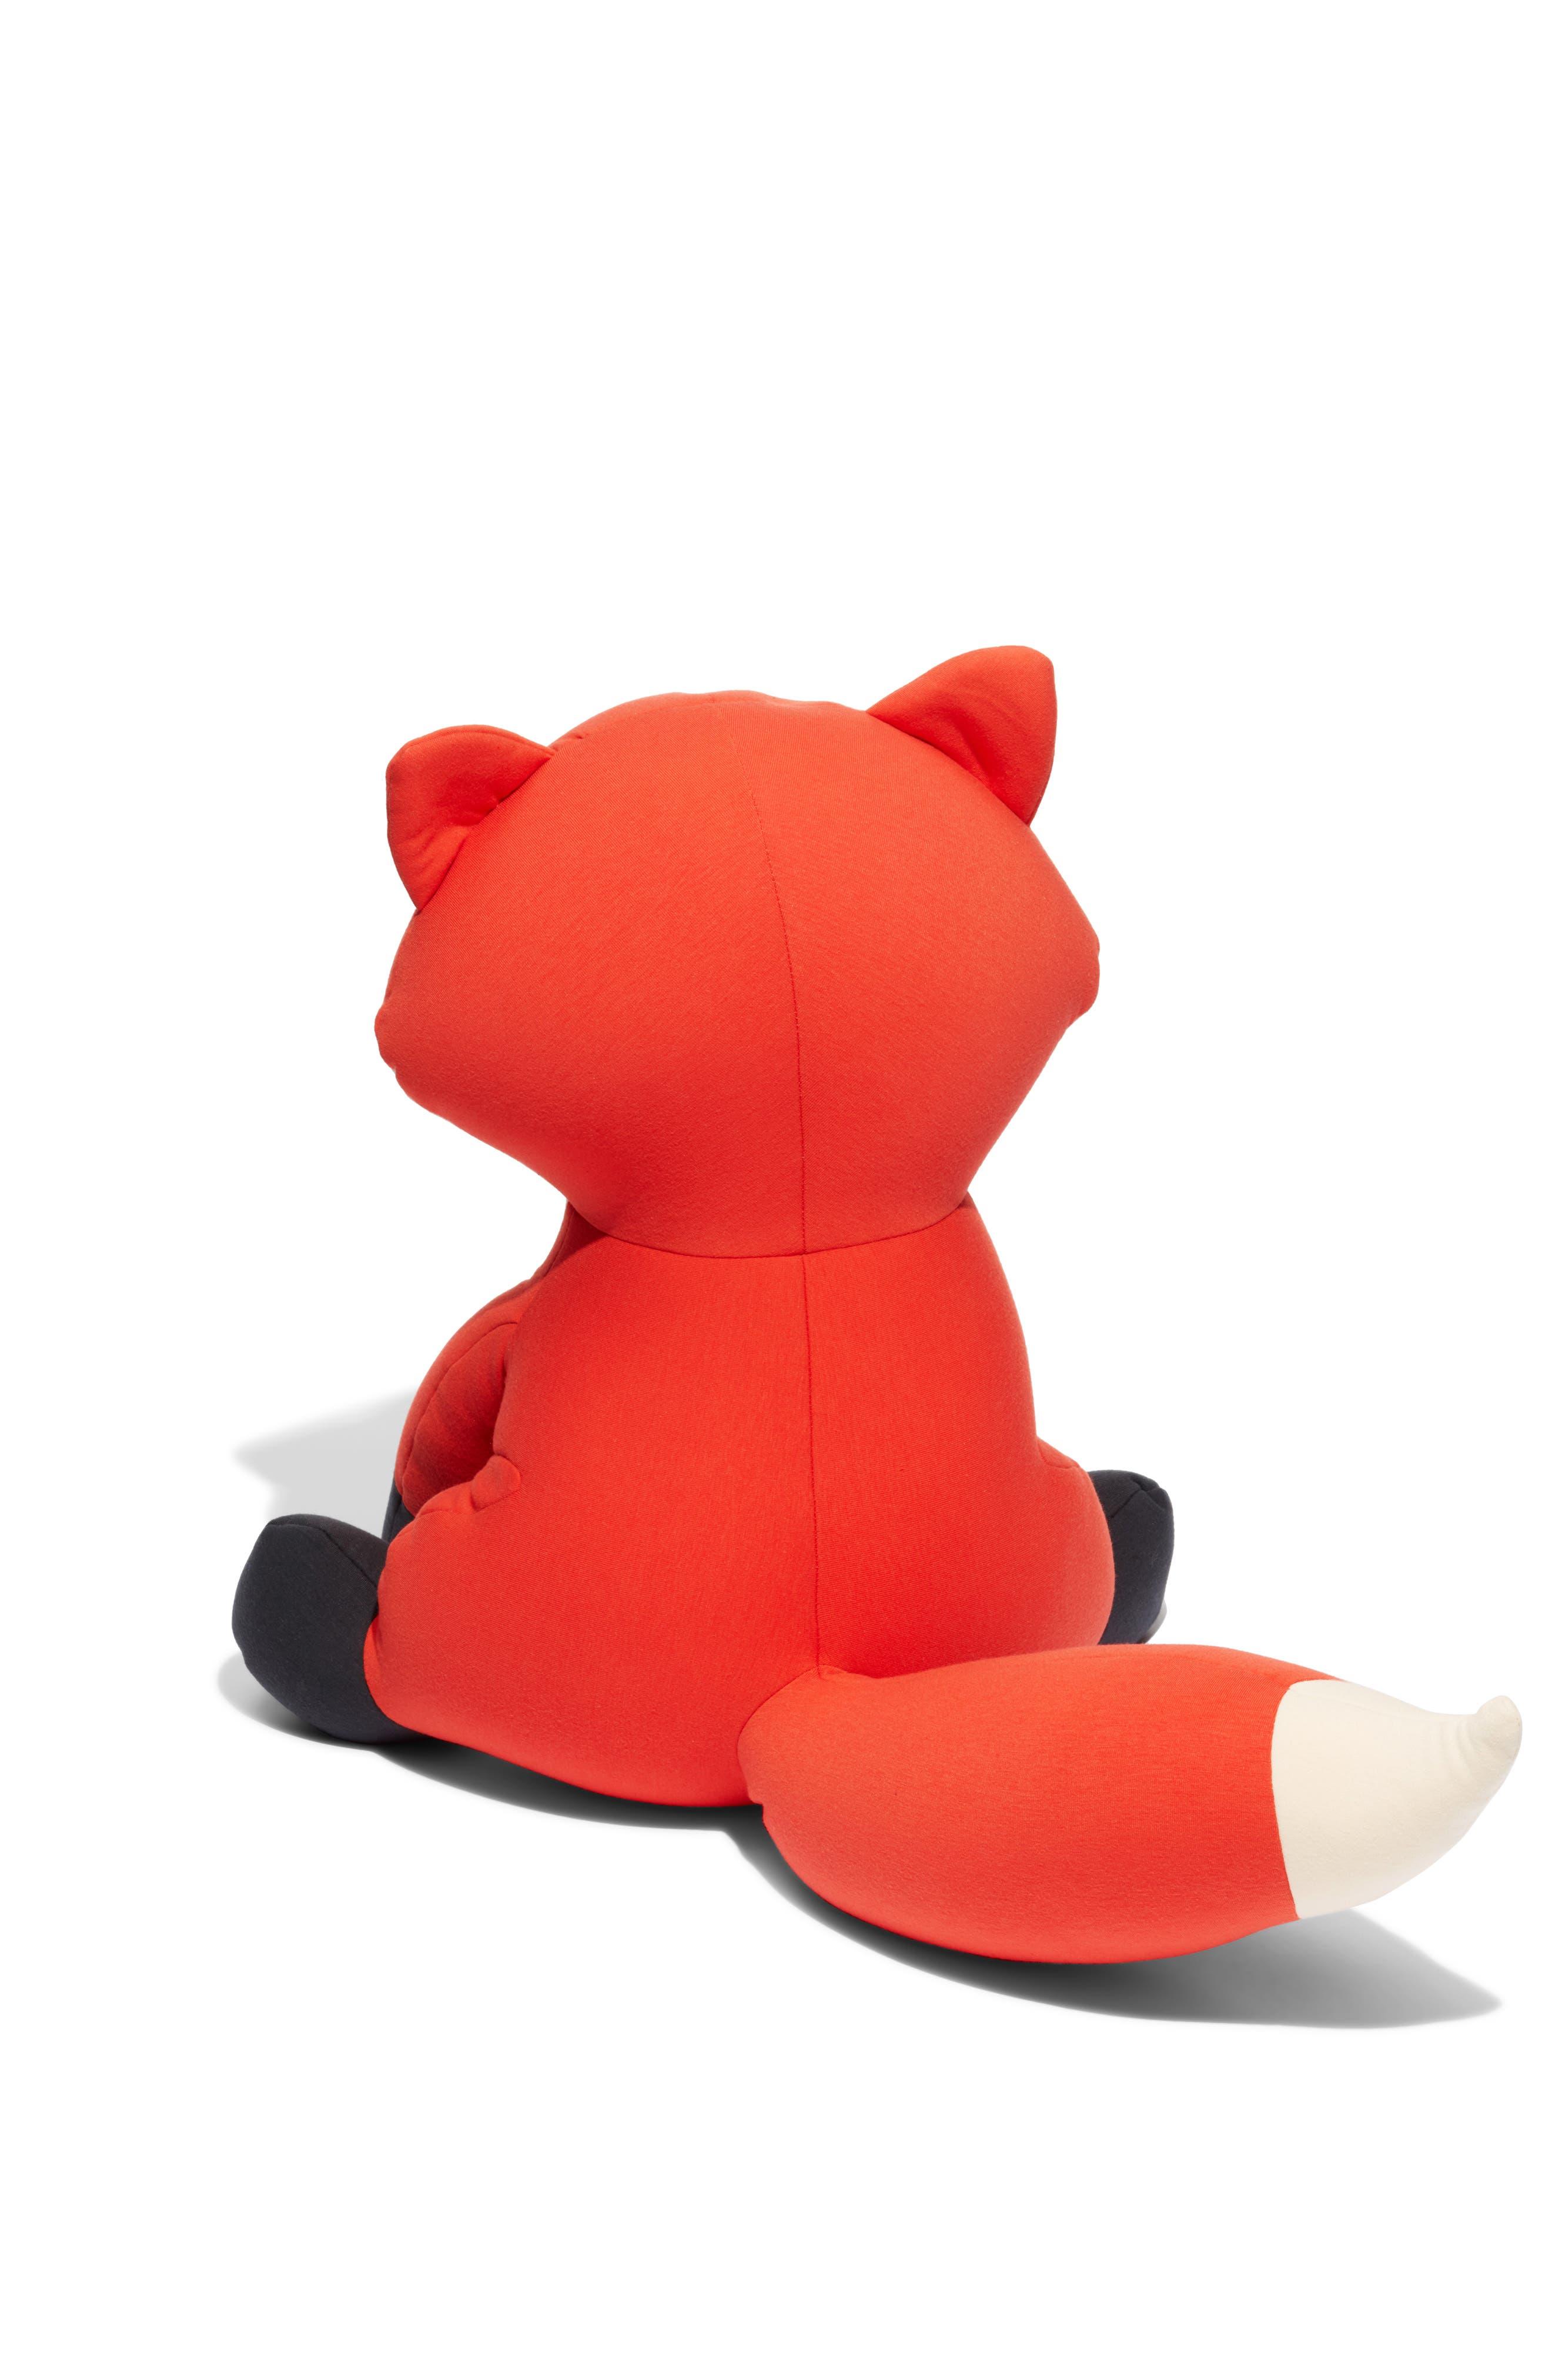 Mega Mate Stuffed Animal Toy,                             Alternate thumbnail 2, color,                             ORANGE